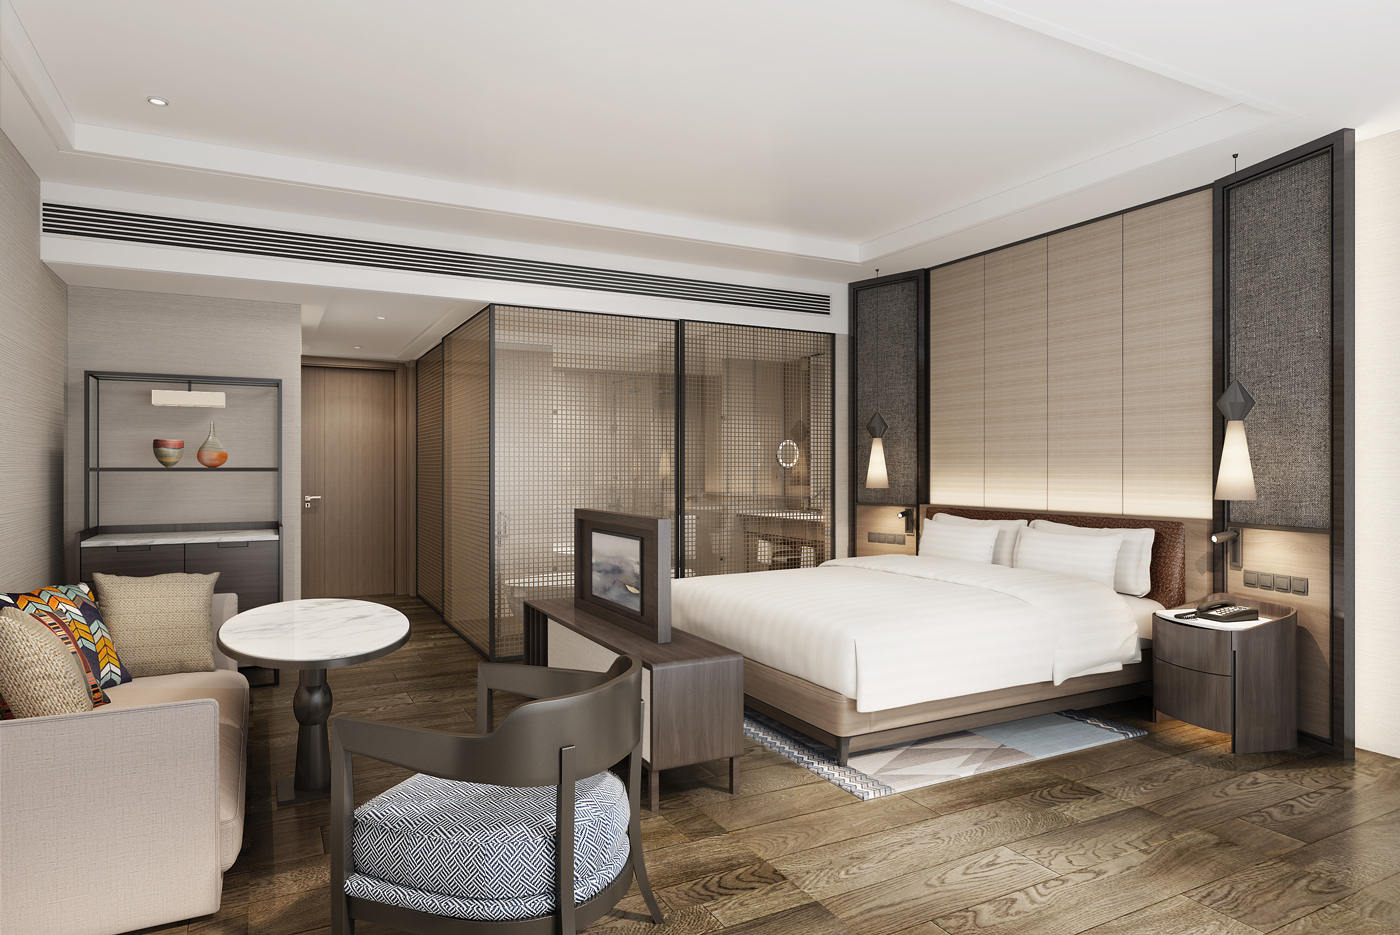 Doubletree-By-Hilton-Resort-_web_5